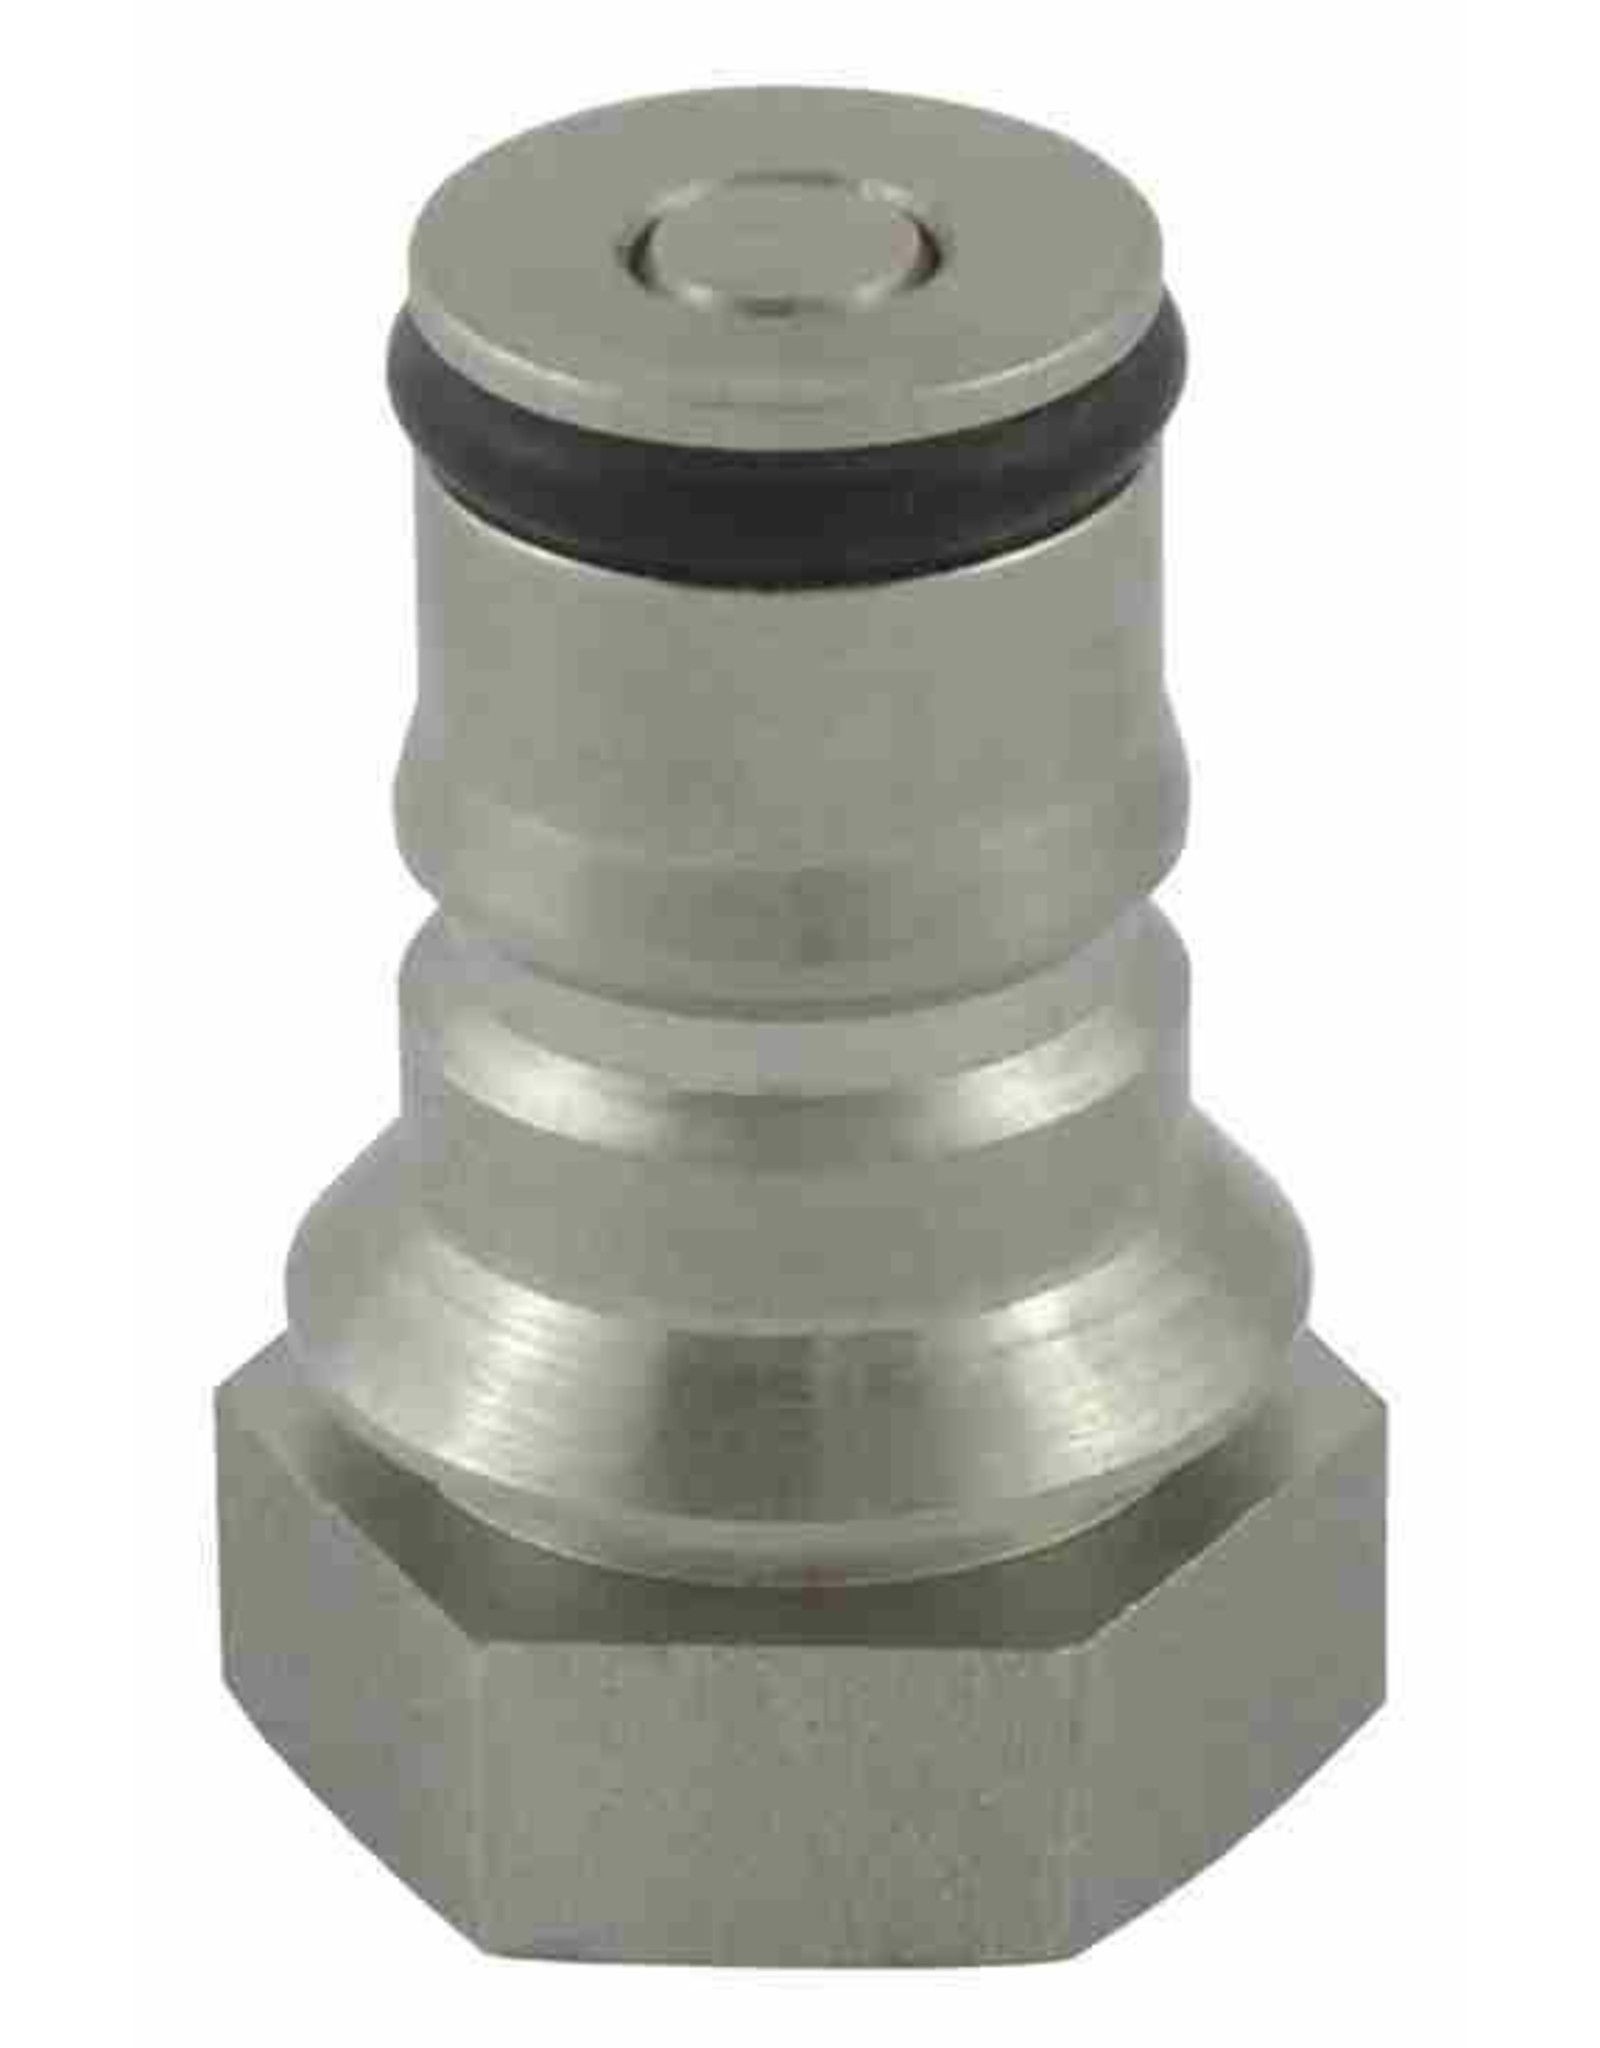 A.E.B. Liquid Plug Post Liquid Out Keg Post 15C07-116